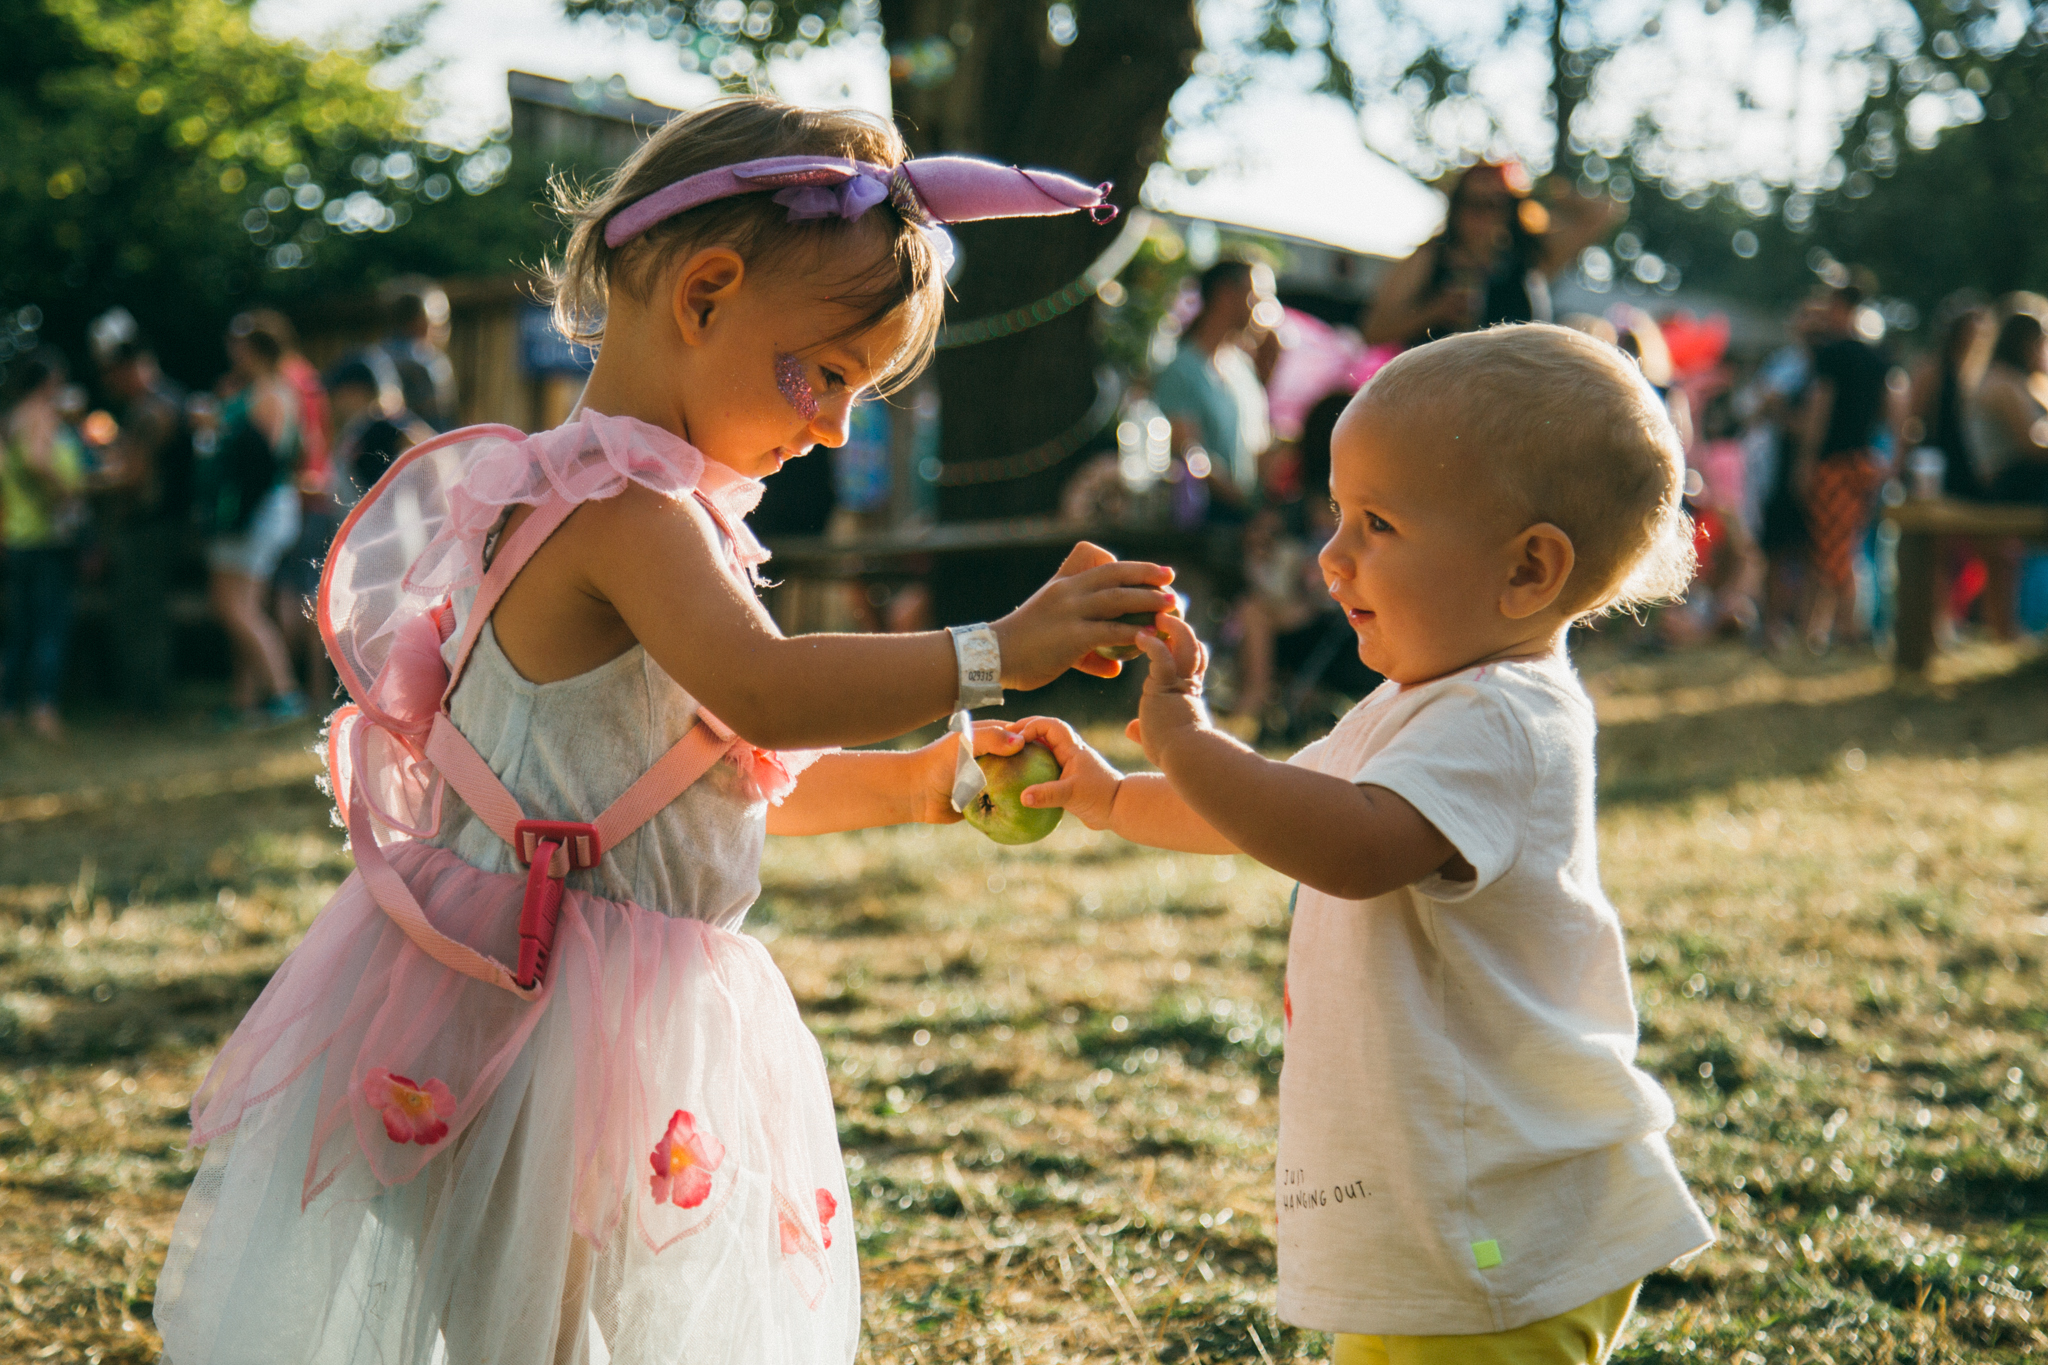 Sibling love at Nozstock 2018 - credit Charlie Rimmer